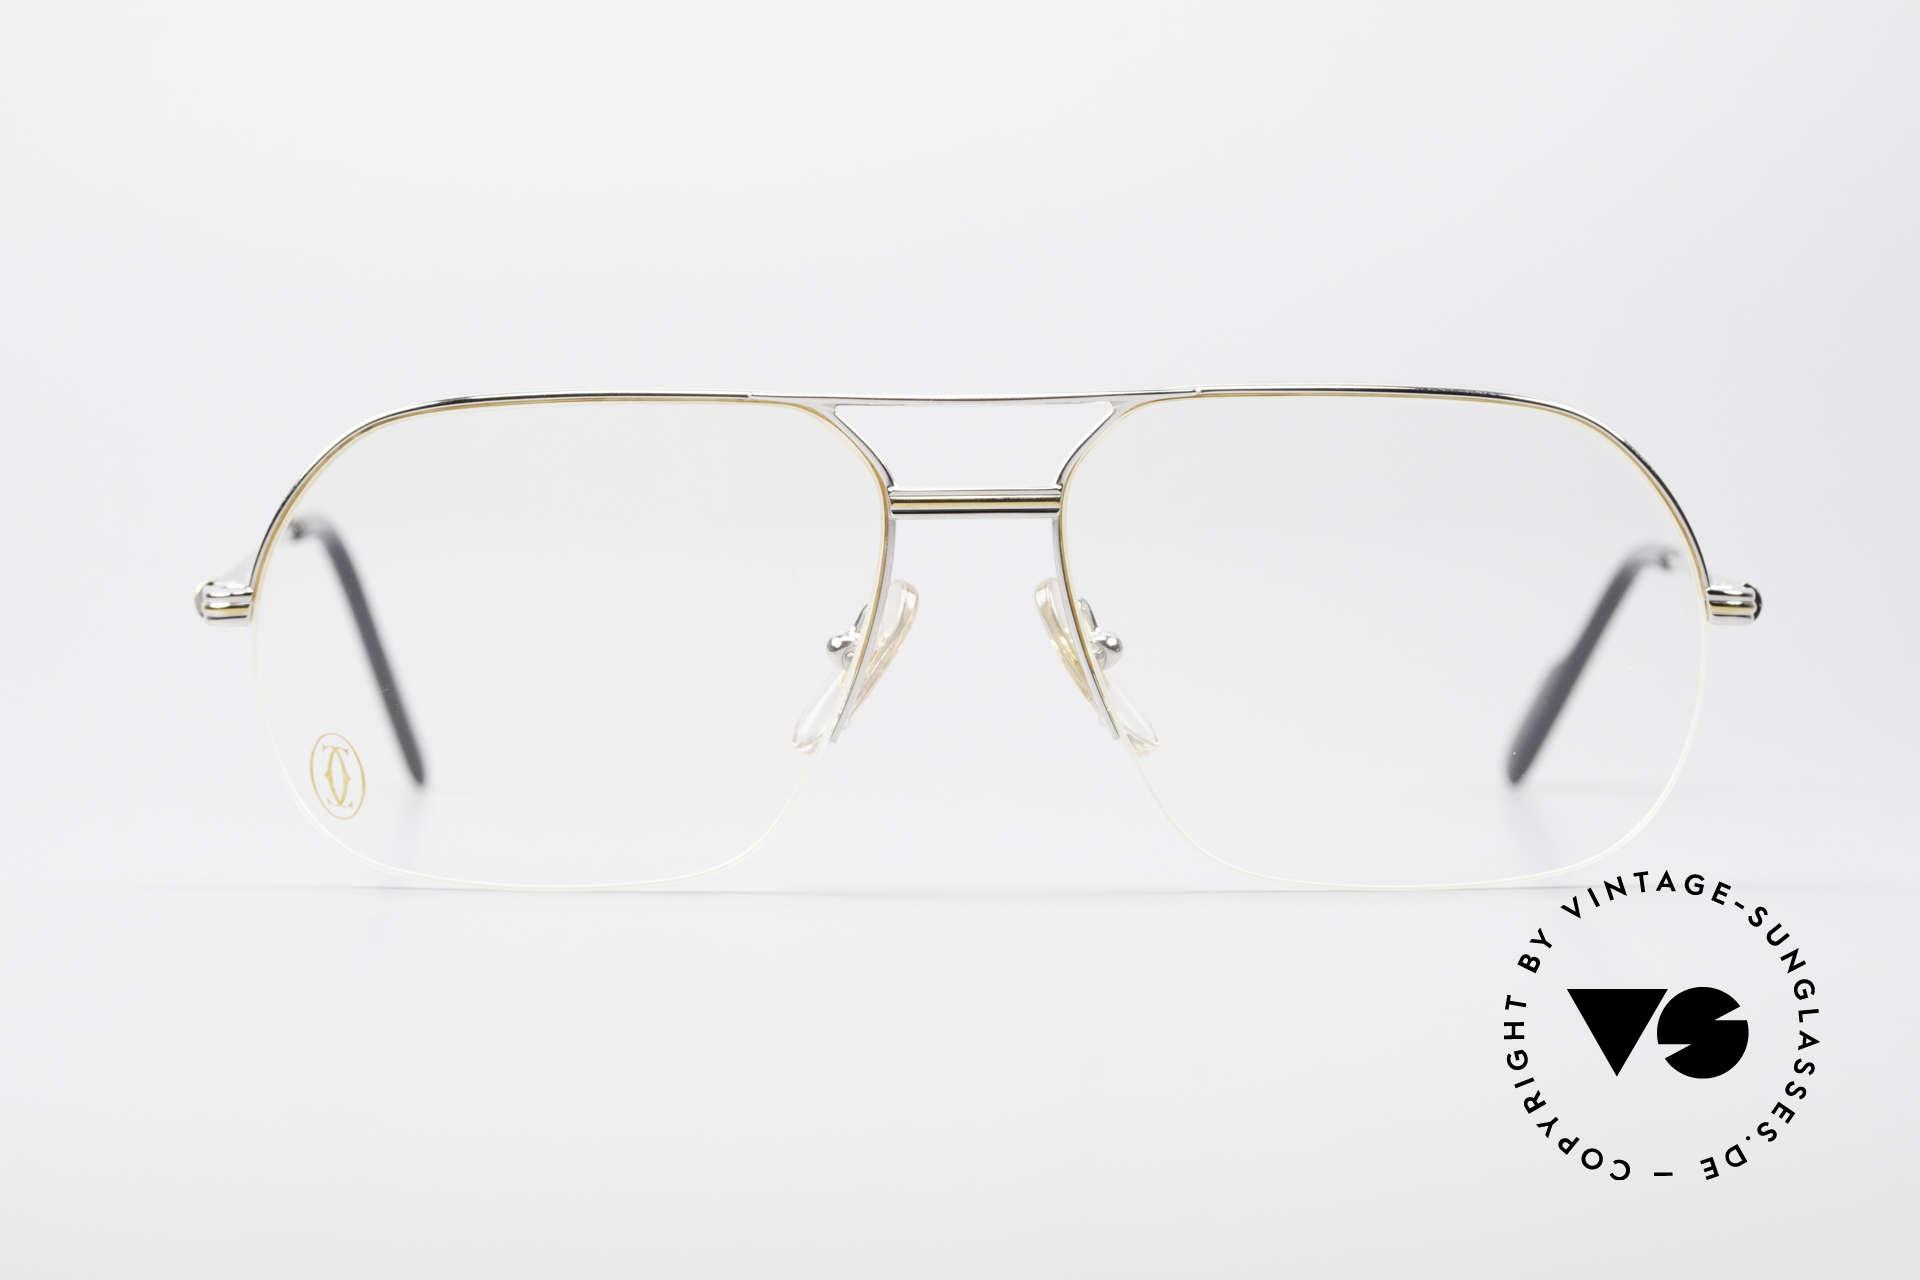 aca1a2733fb4 Glasses Cartier Orsay Luxury Platinum Eyeglasses